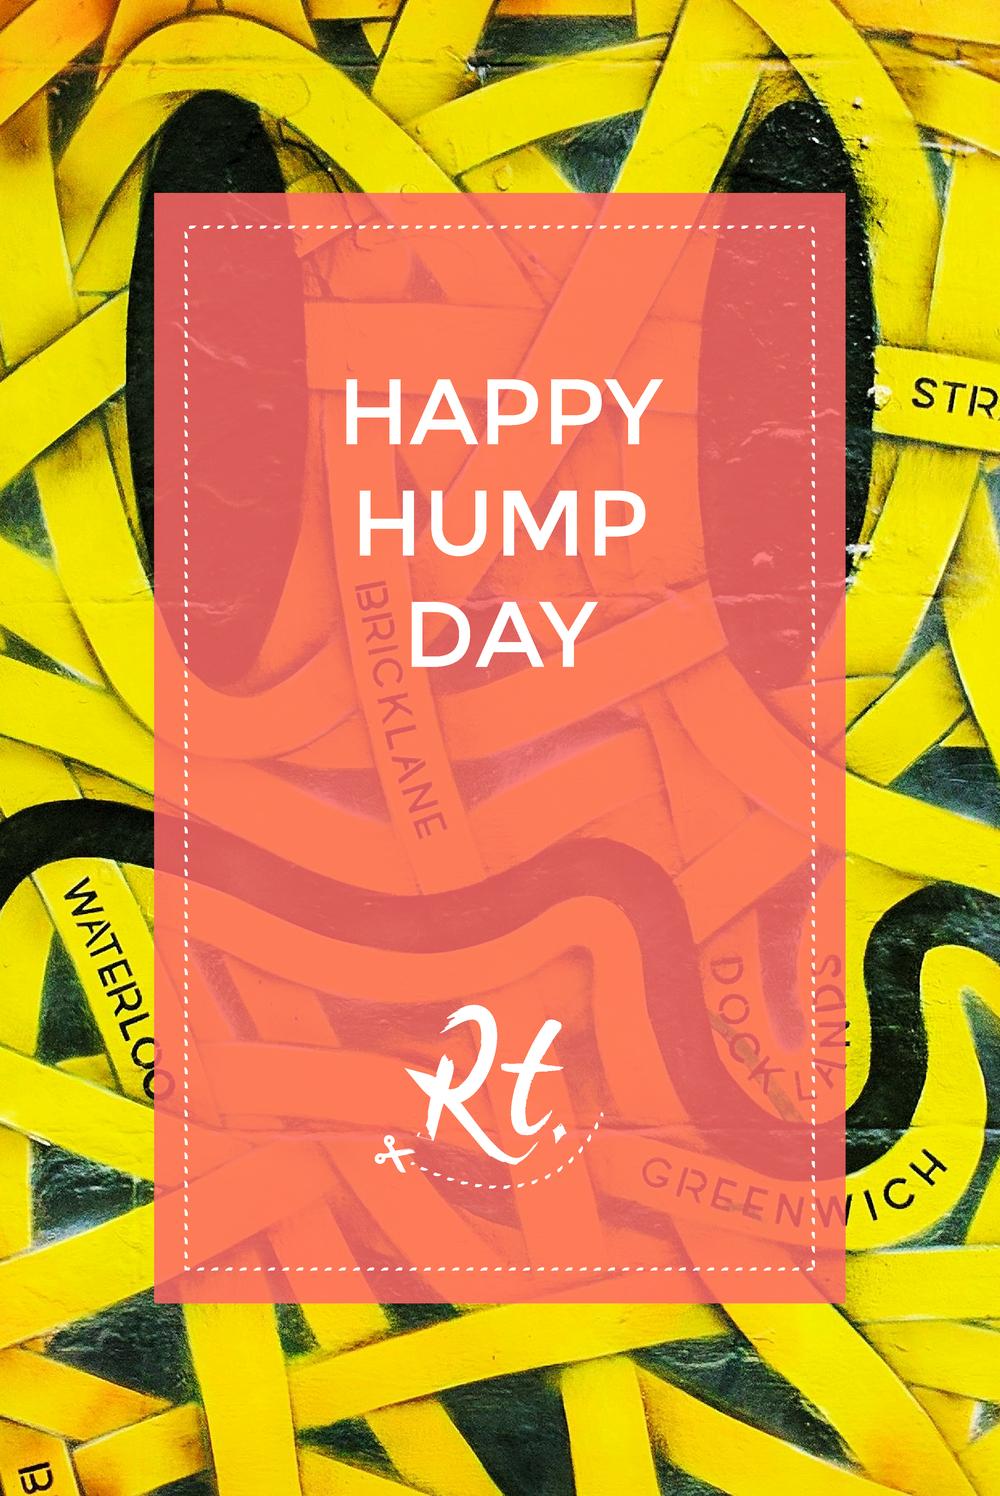 Happy Hump Day by Rosh Thanki, Otto Schade London smiley, street art at Brick Lane